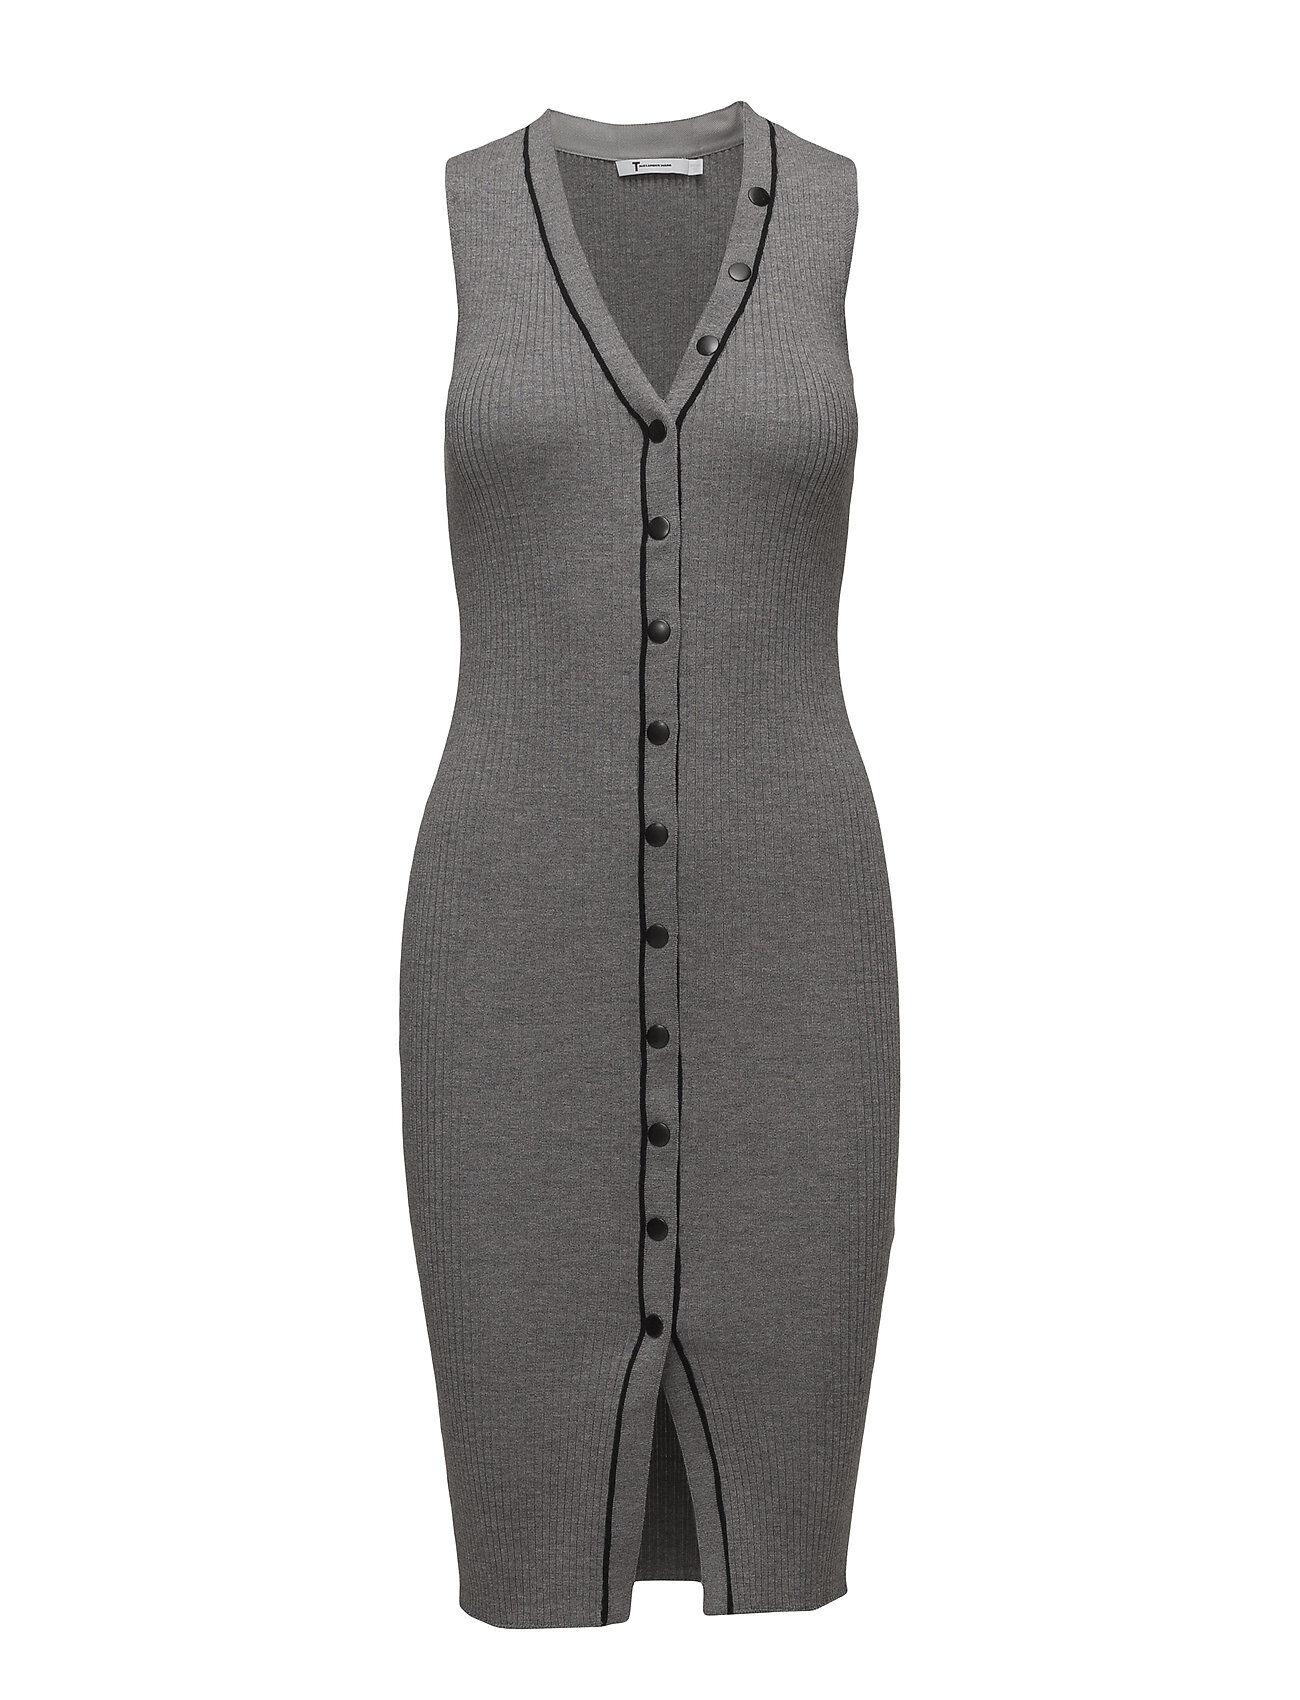 T by Alexander Wang Skinny Rib Sleeveless Dress W/ Snap Detail